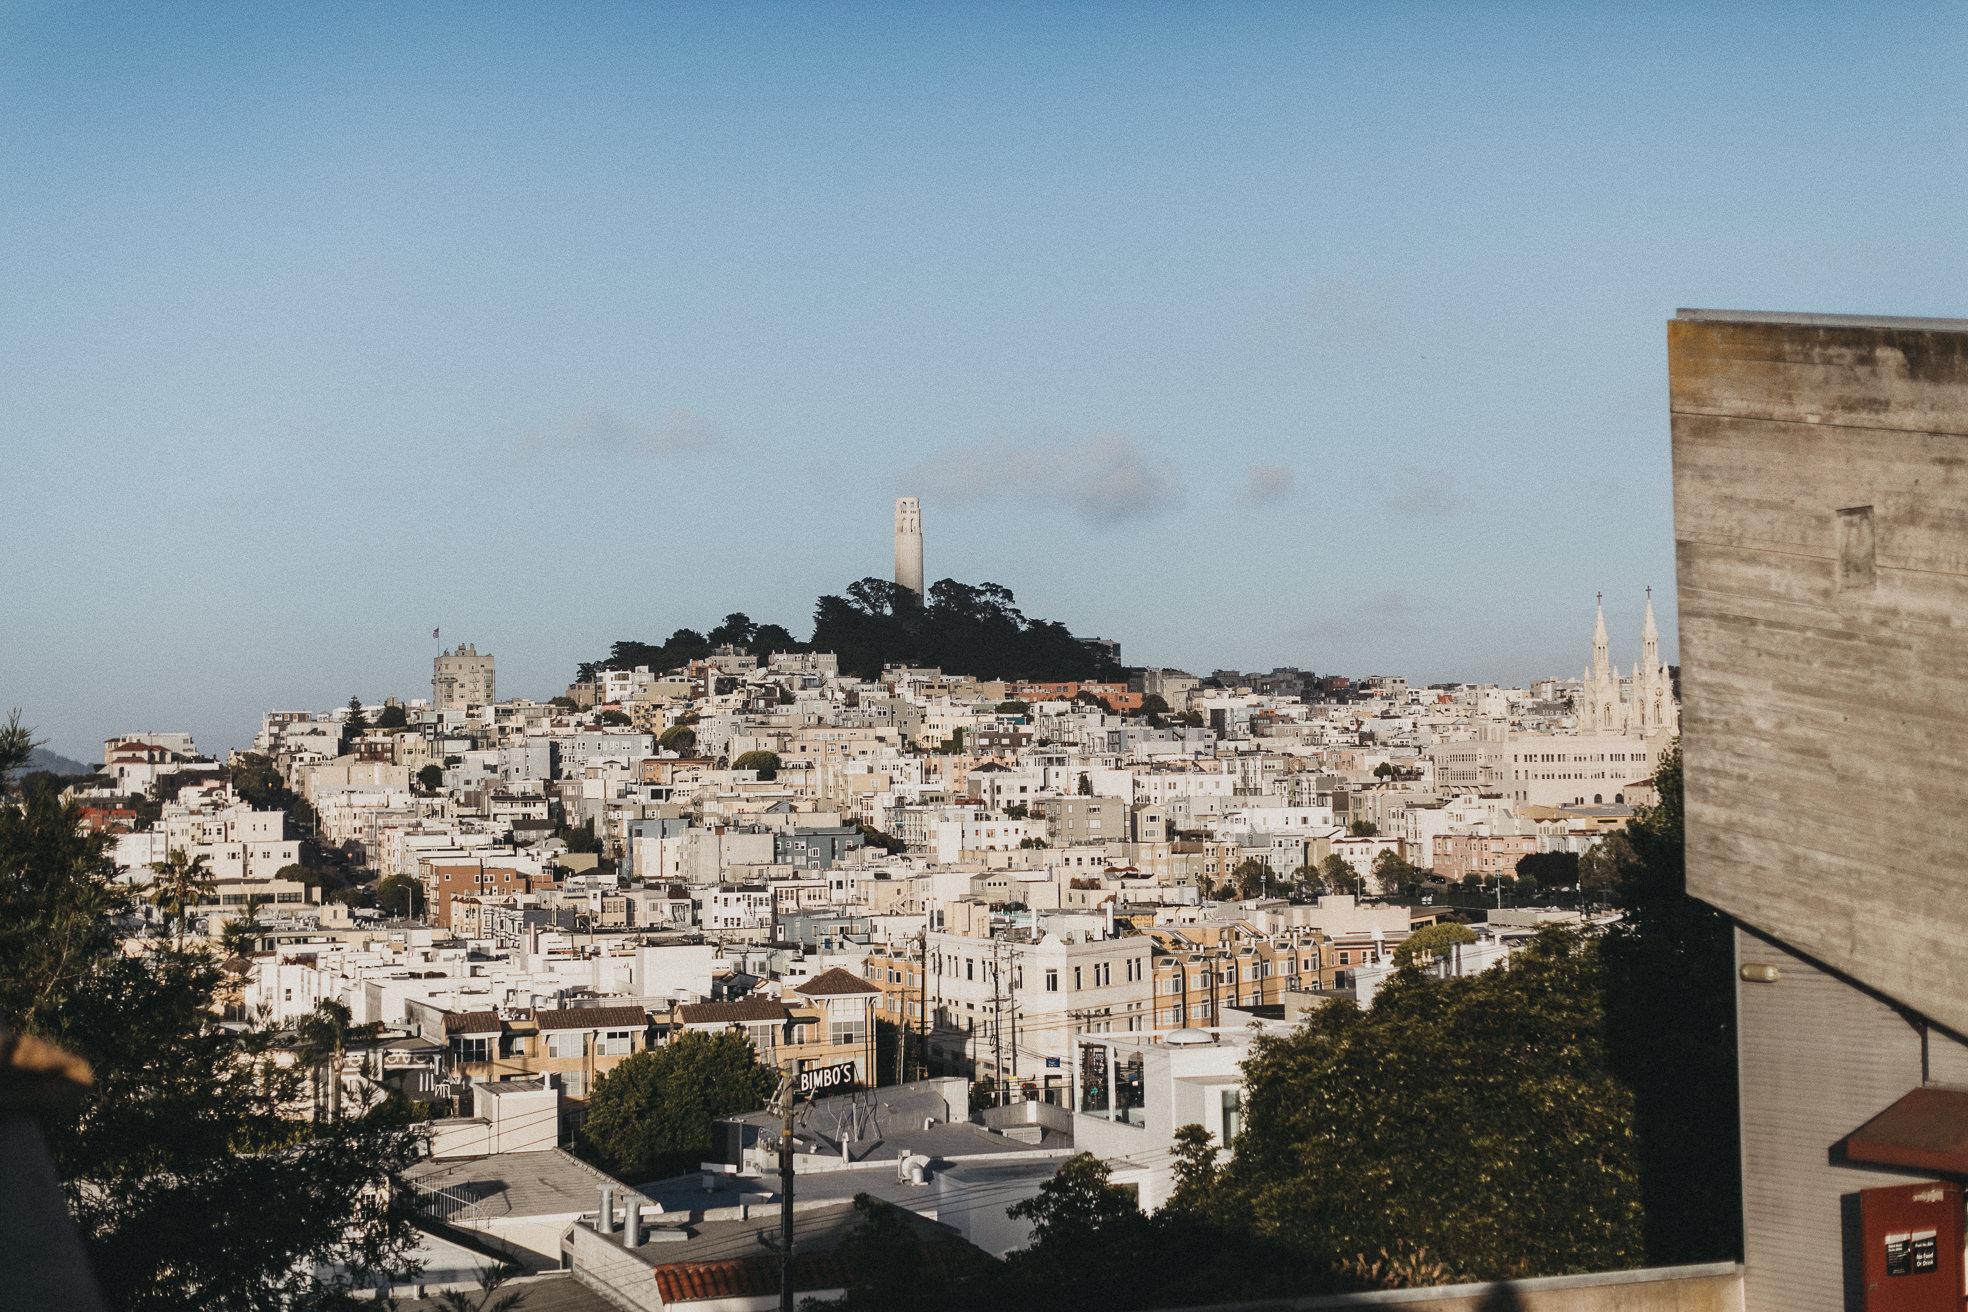 San-Francisco-BildervomLeben-9485